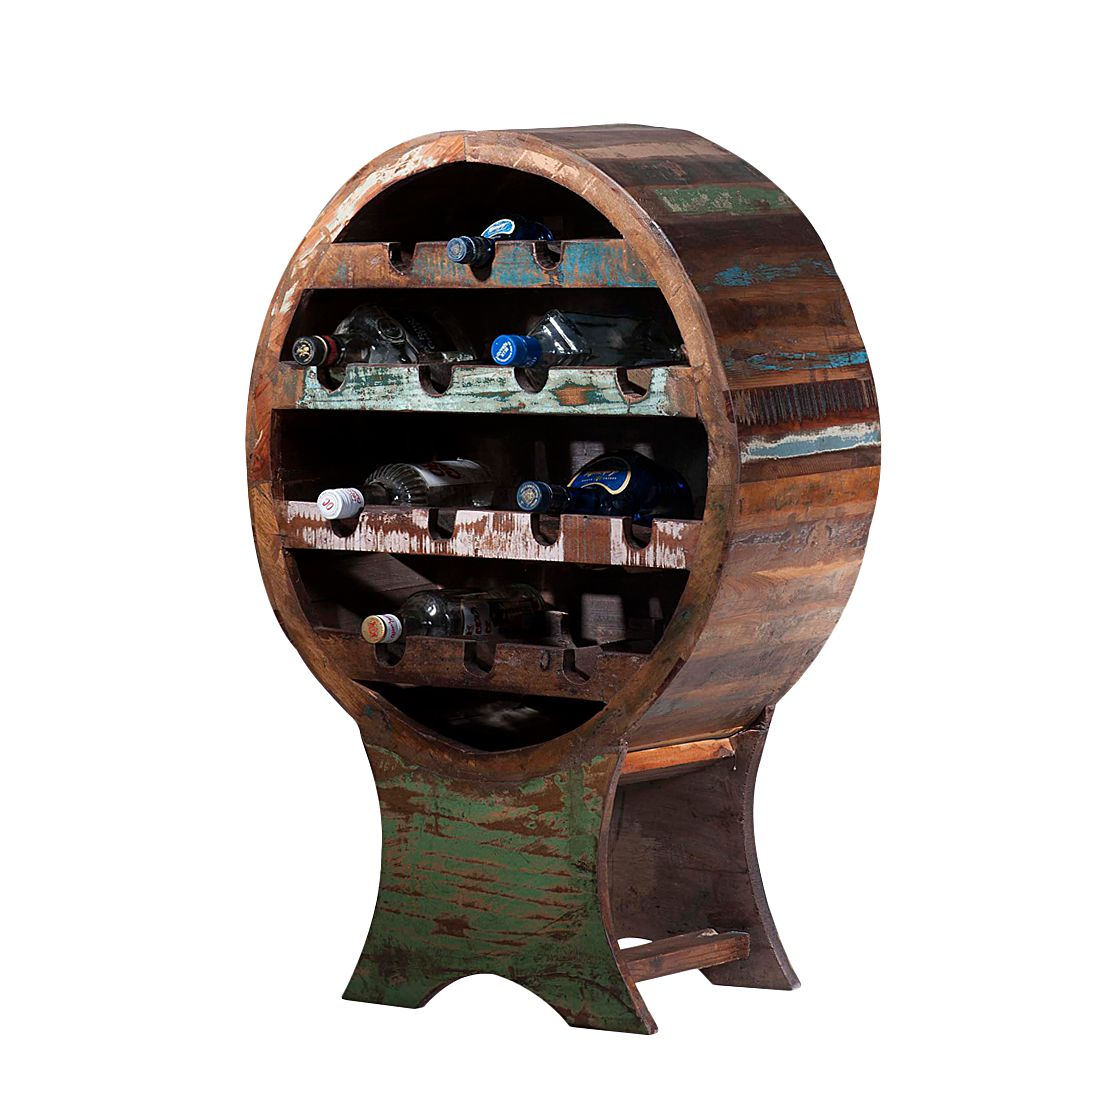 Weinregal Vintage - Recyclingholz - Bunt